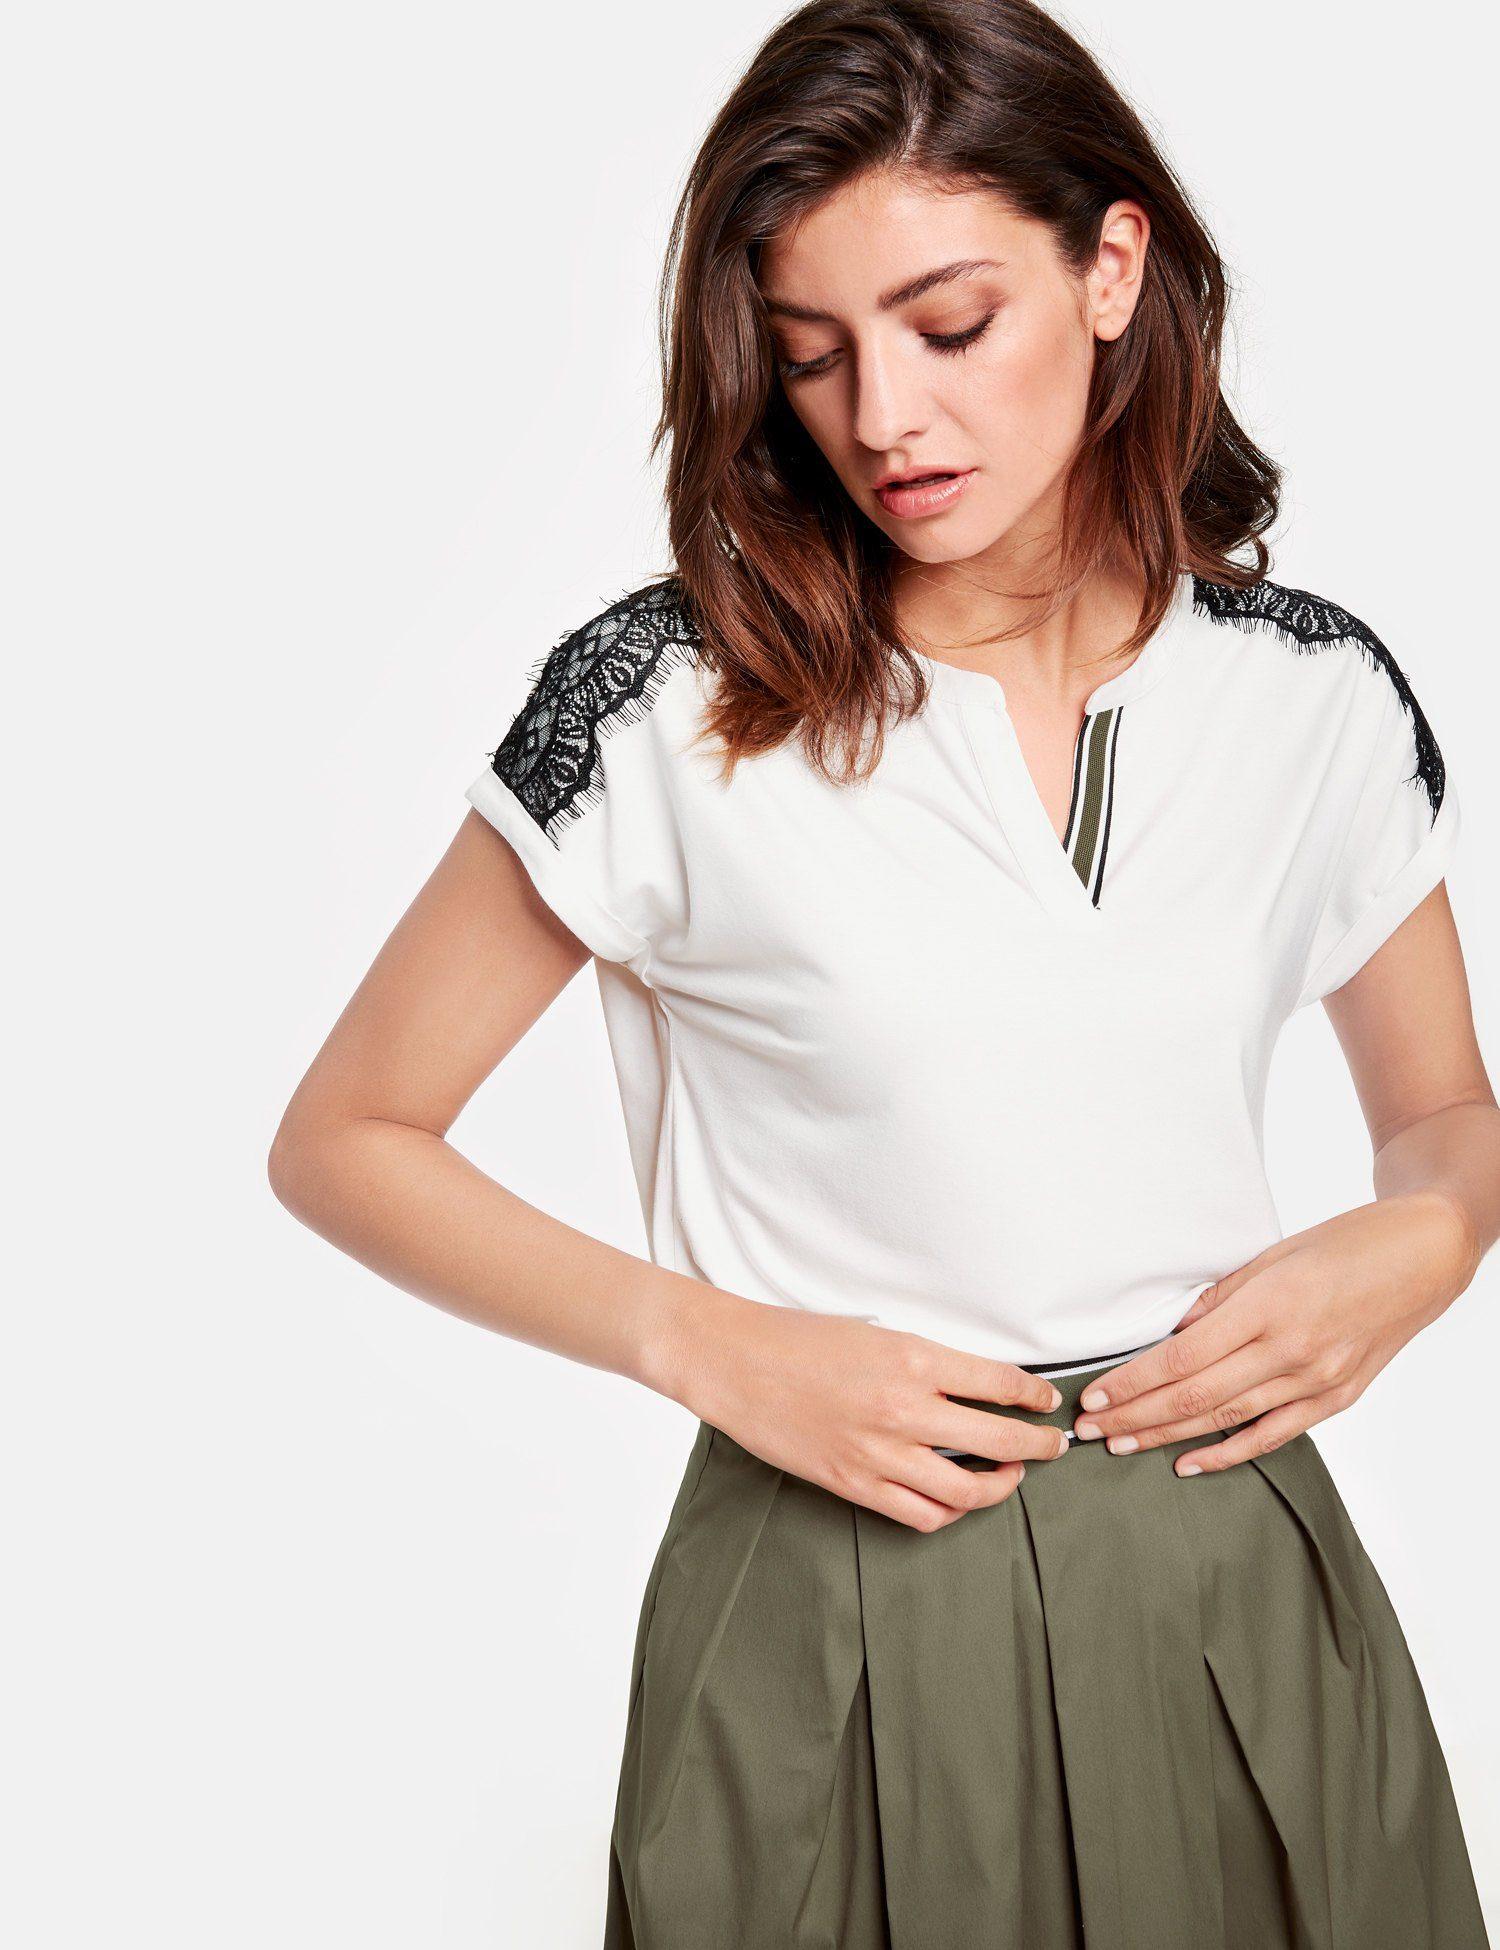 TAIFUN T-Shirt Kurzarm Rundhals »Shirt mit Kontrast-Spitze«